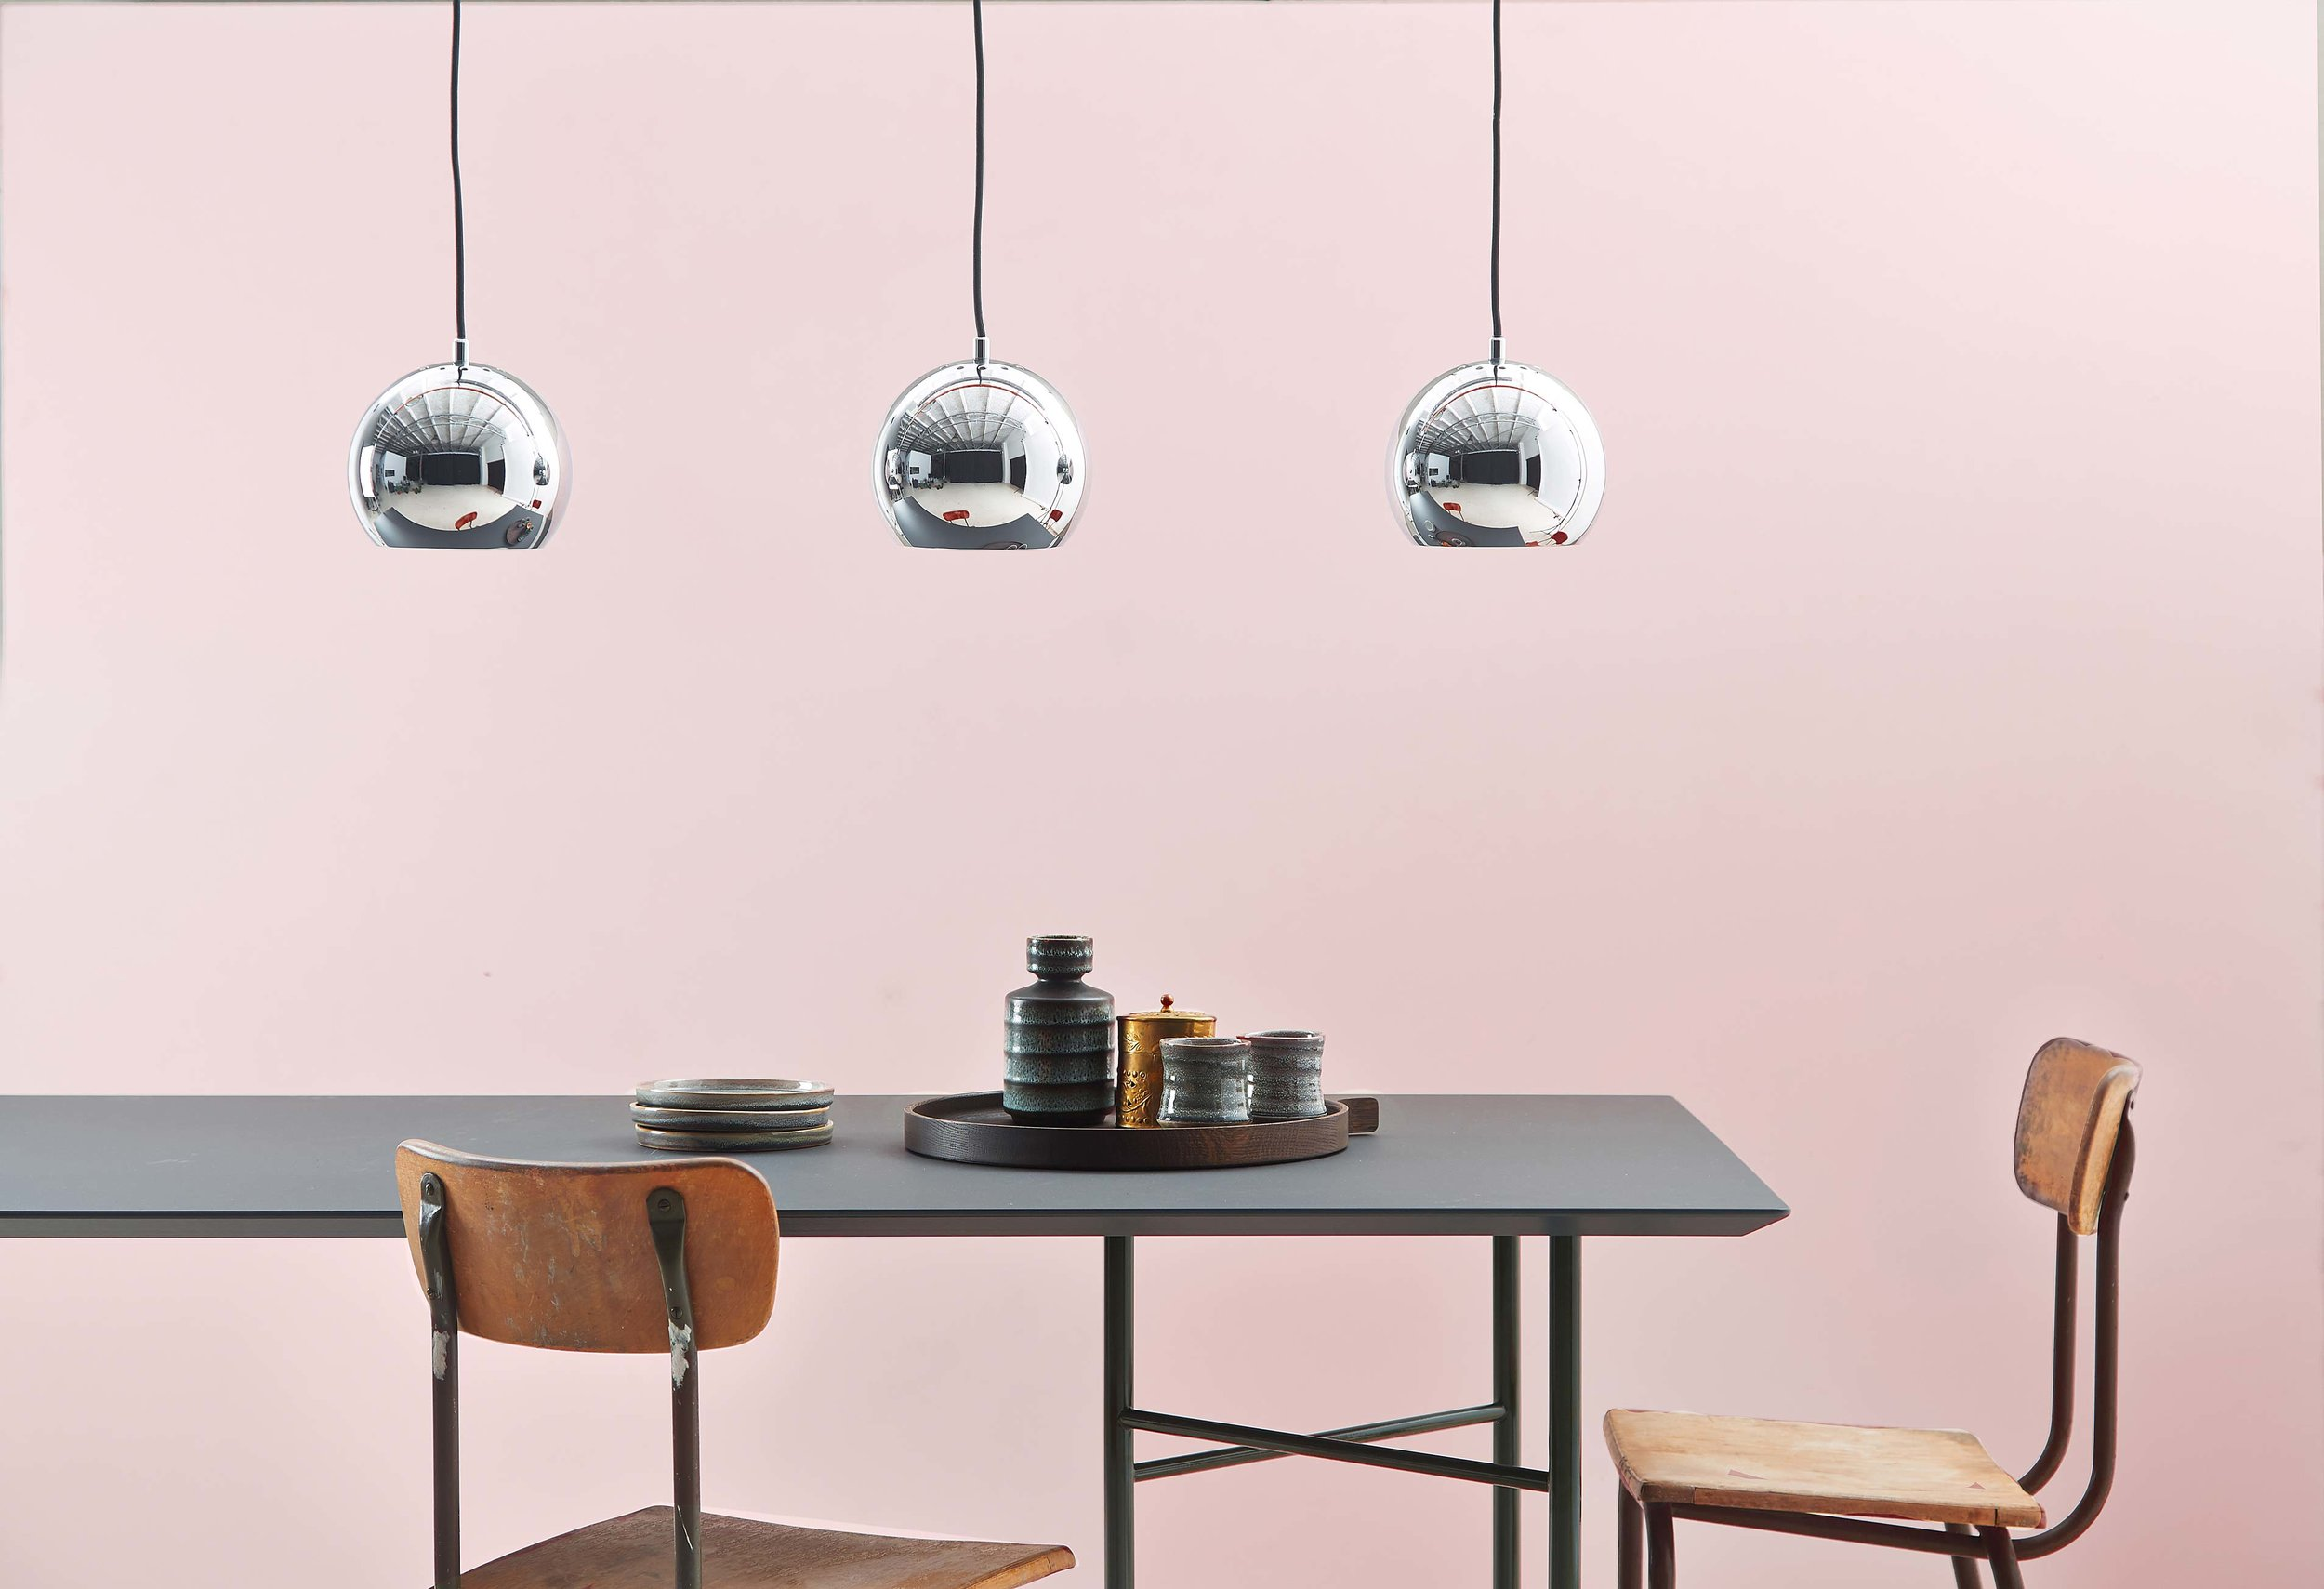 Ball-track-chrome-glossy---lifestyle-Studio-Horsens-1360.jpg